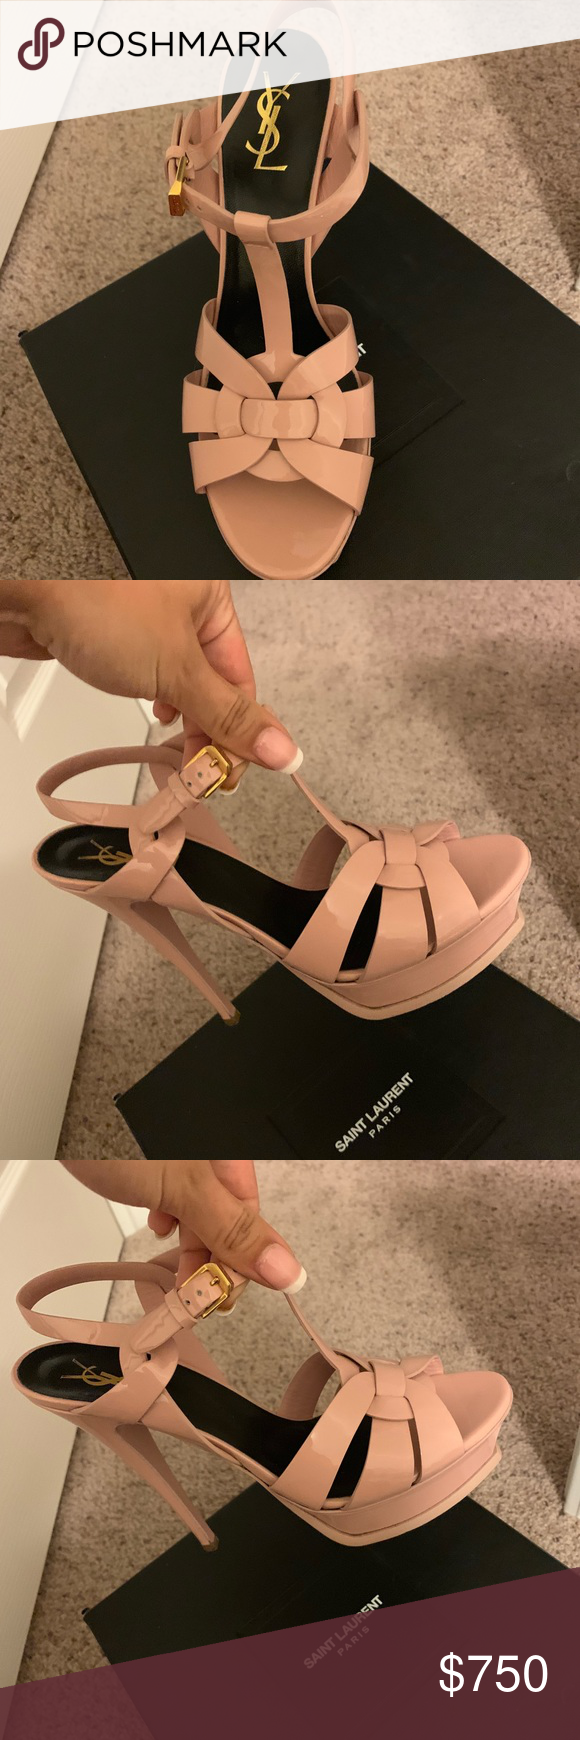 Yves Saint Laurent Heels Yves saint laurent shoes, Ysl